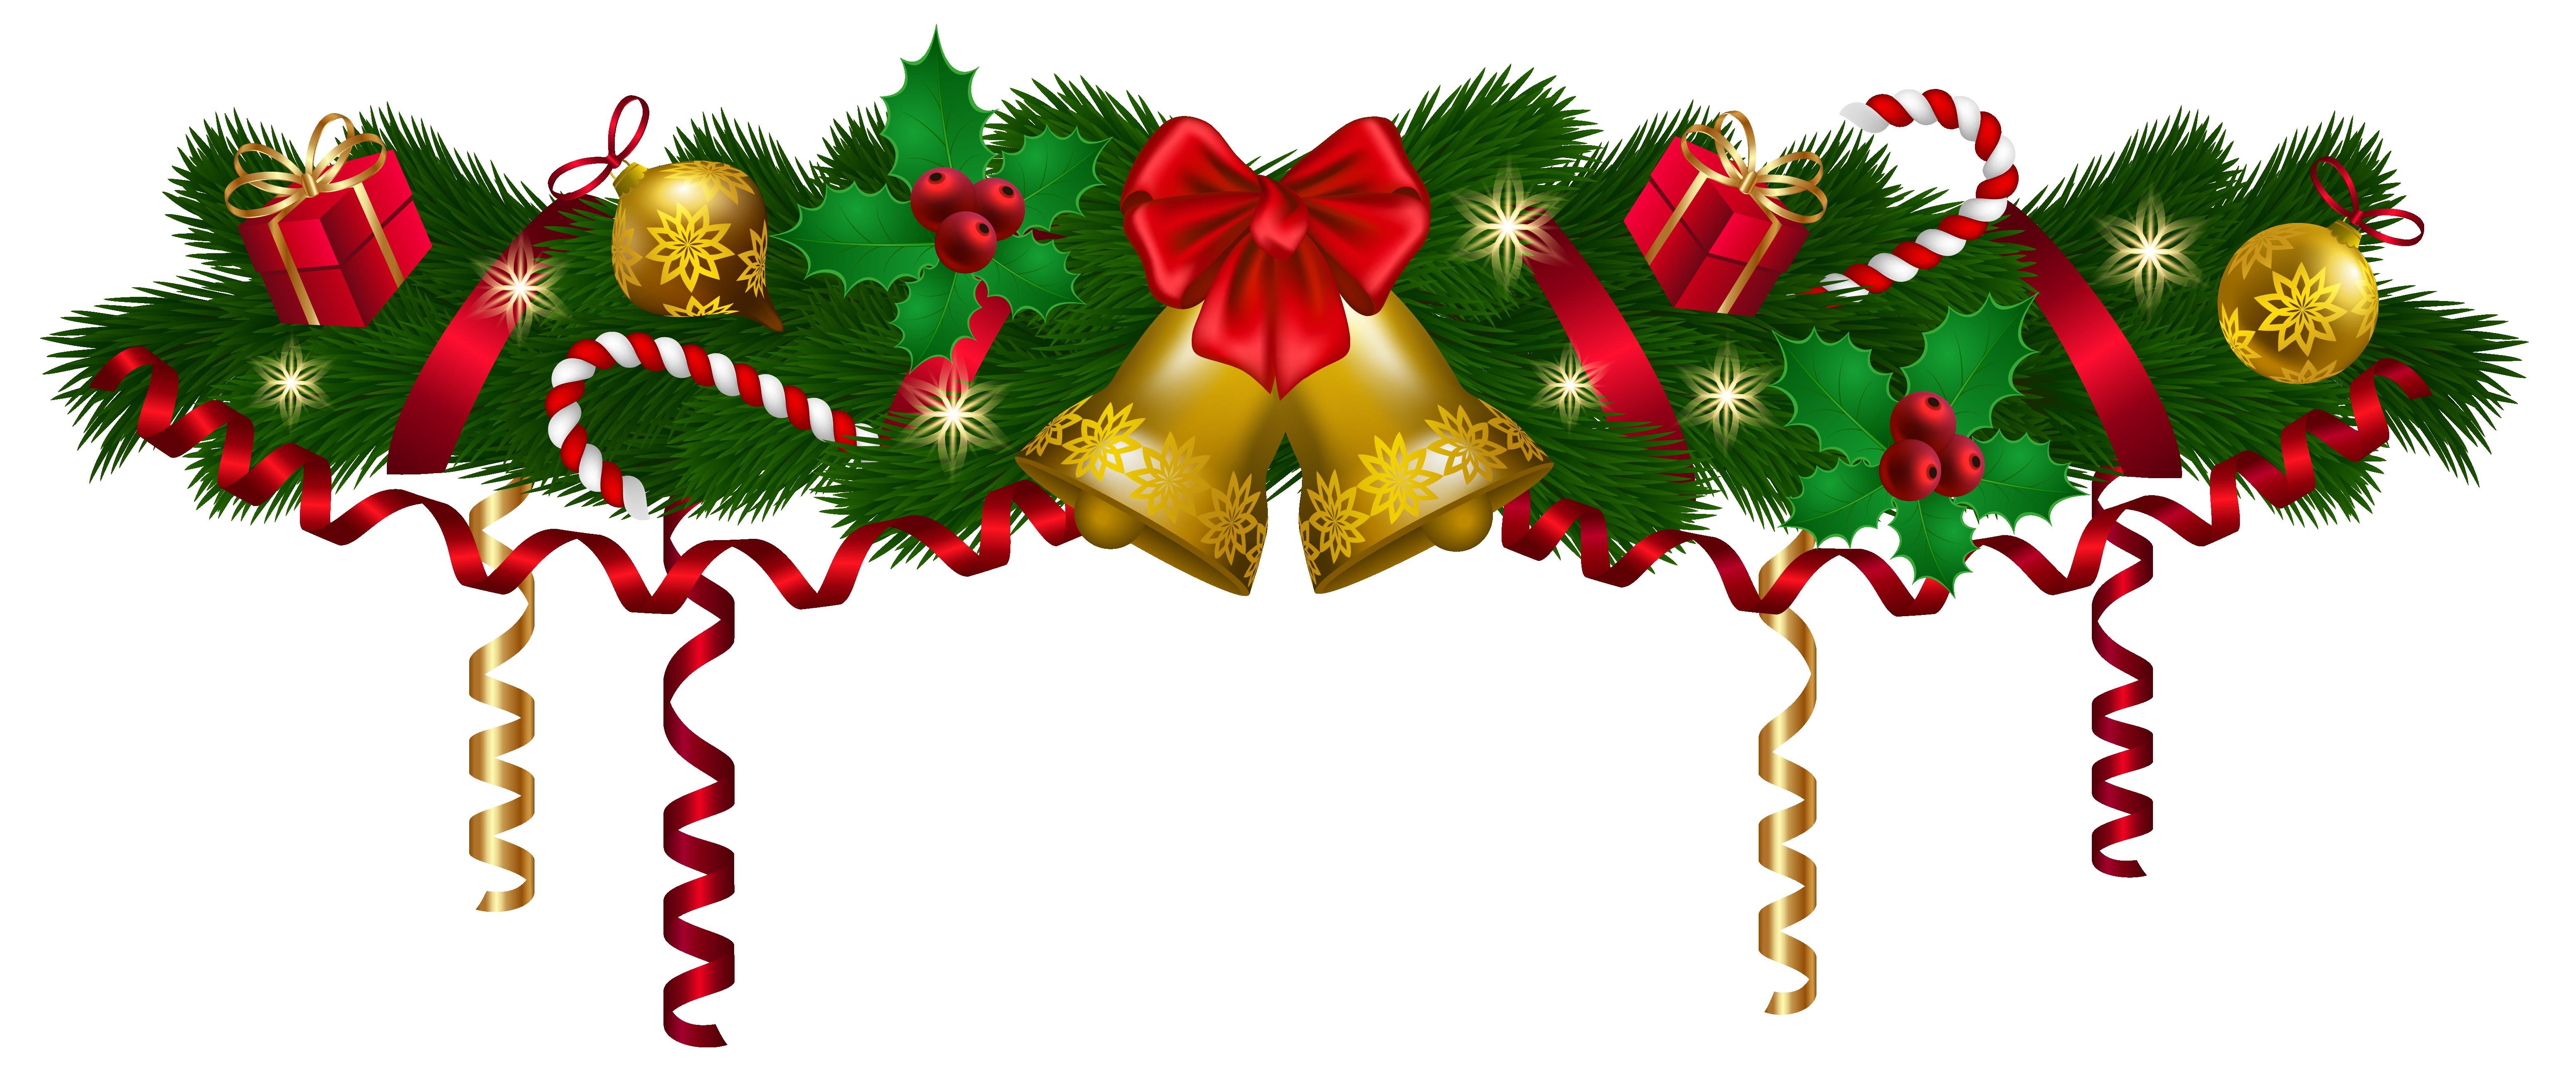 Christmas Deco Garland PNG Clip Art Image.